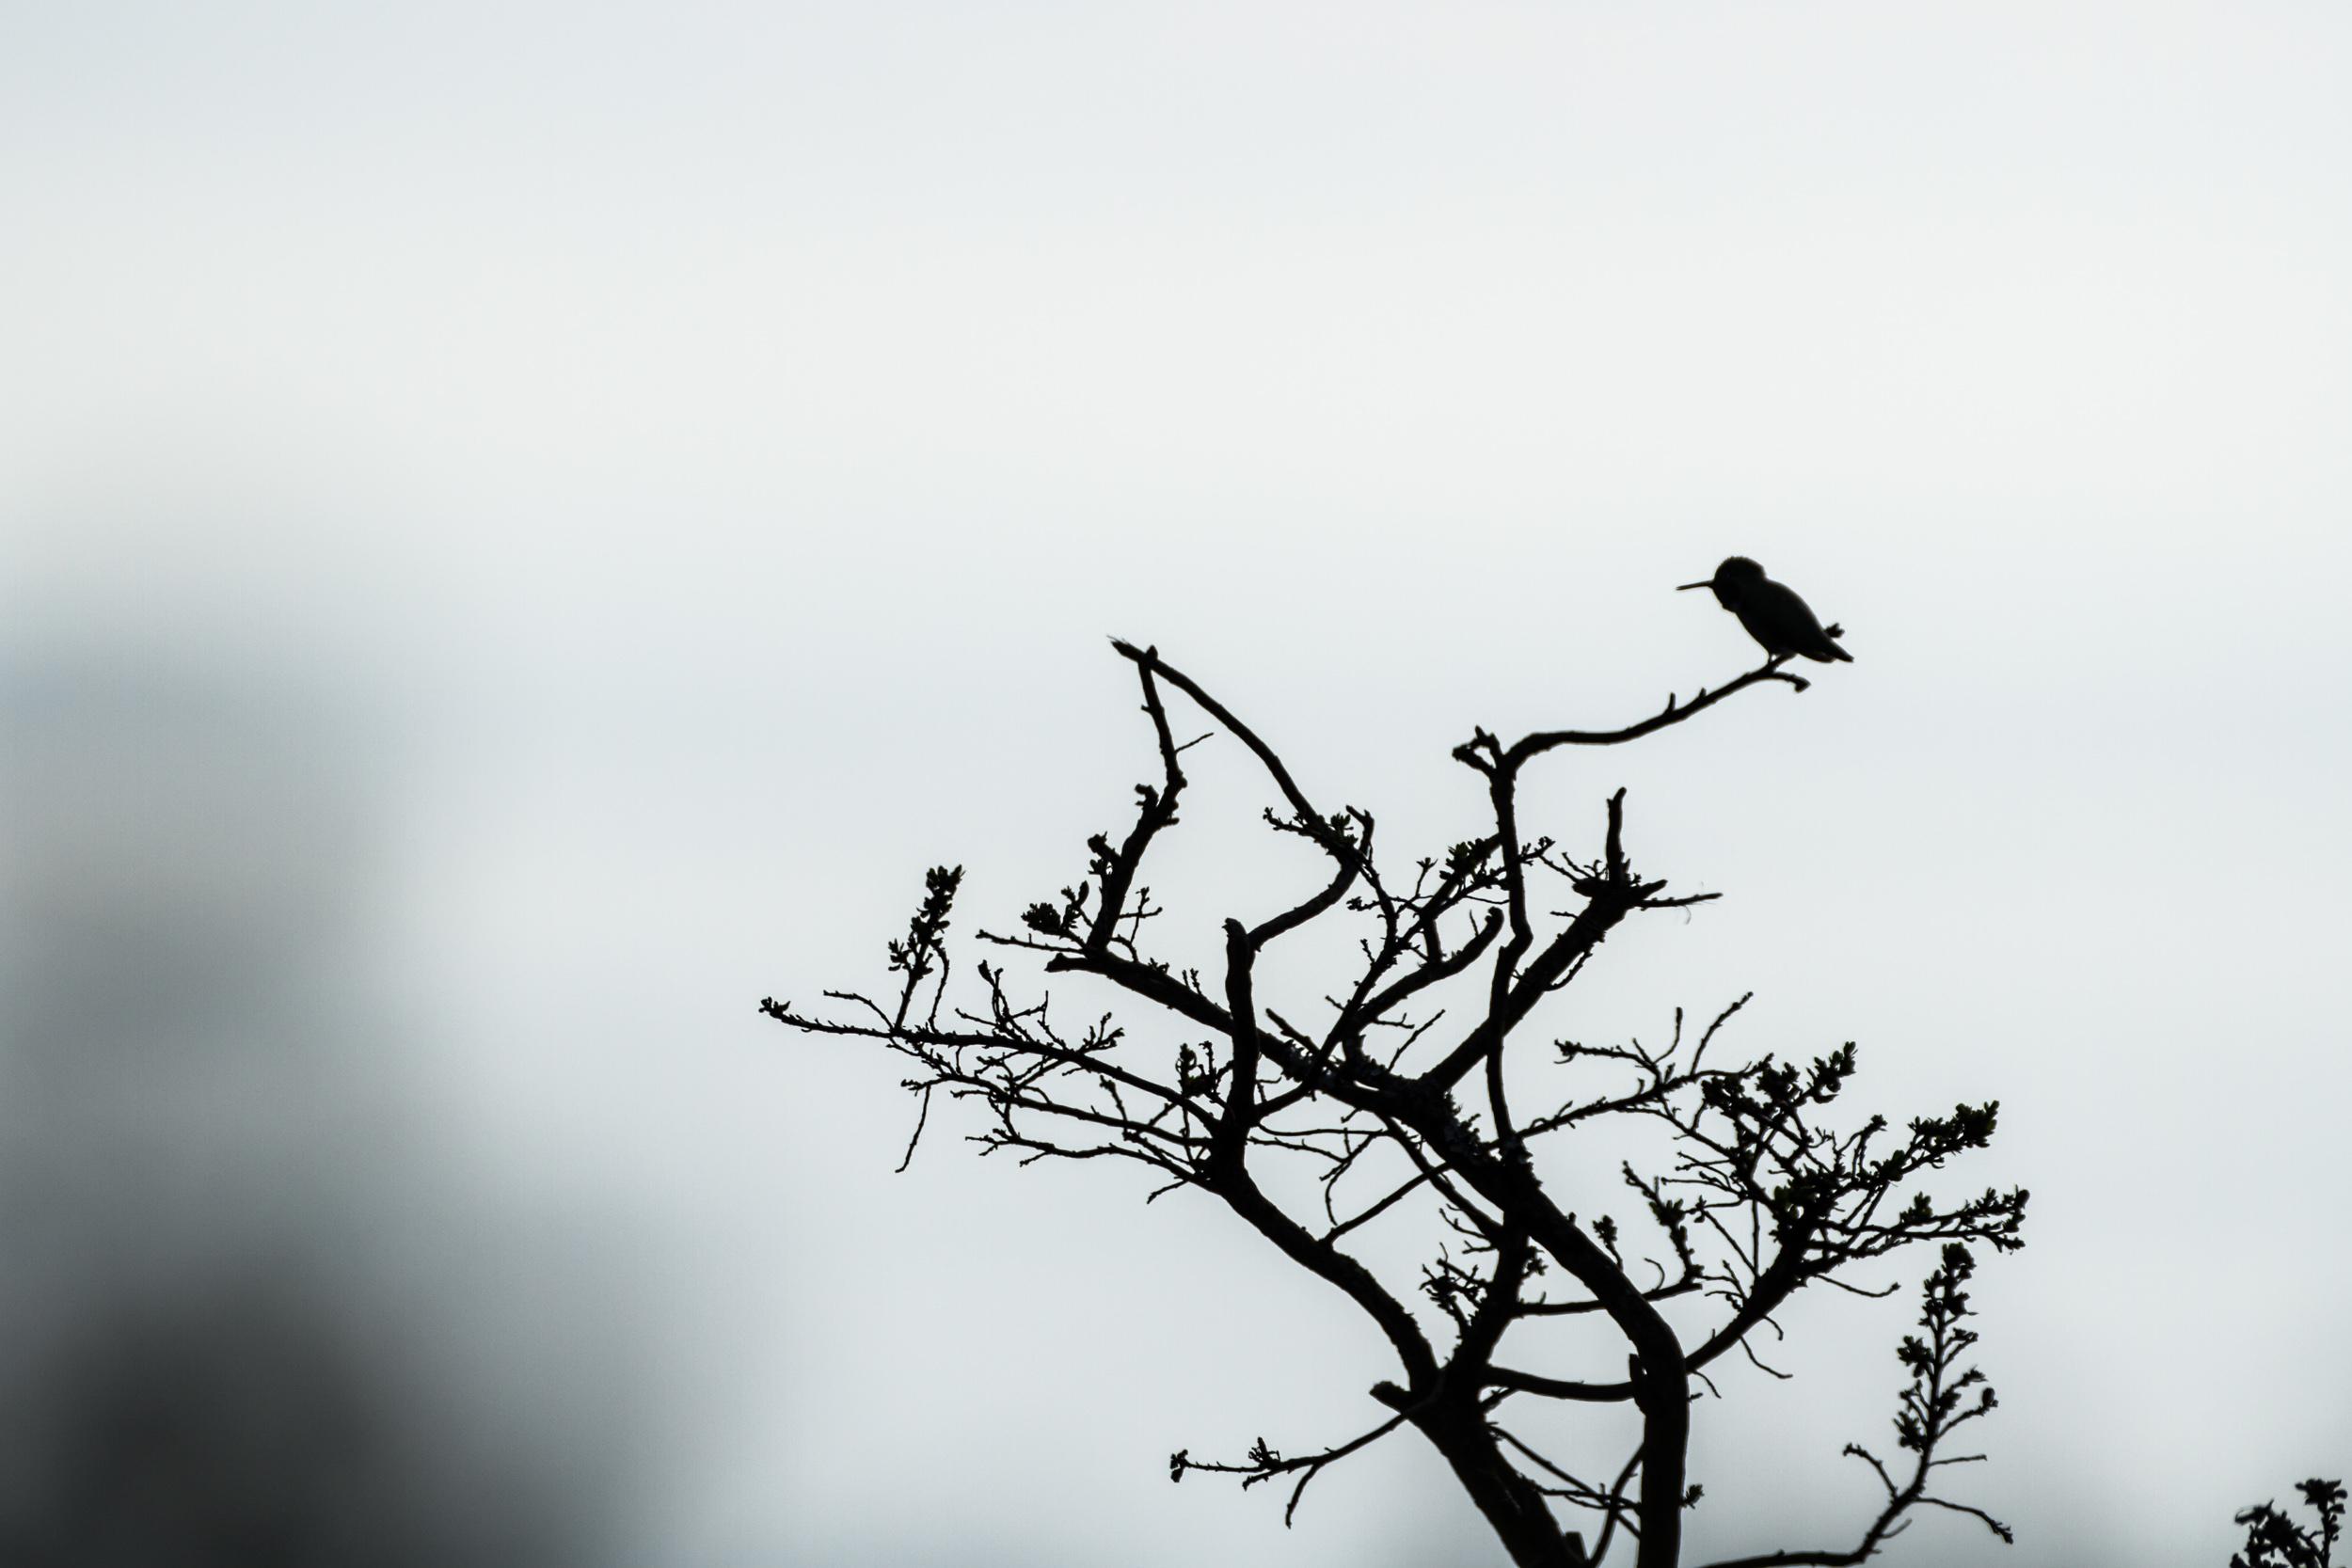 Wallpaper Wednesday – Hummingbird Silhouette